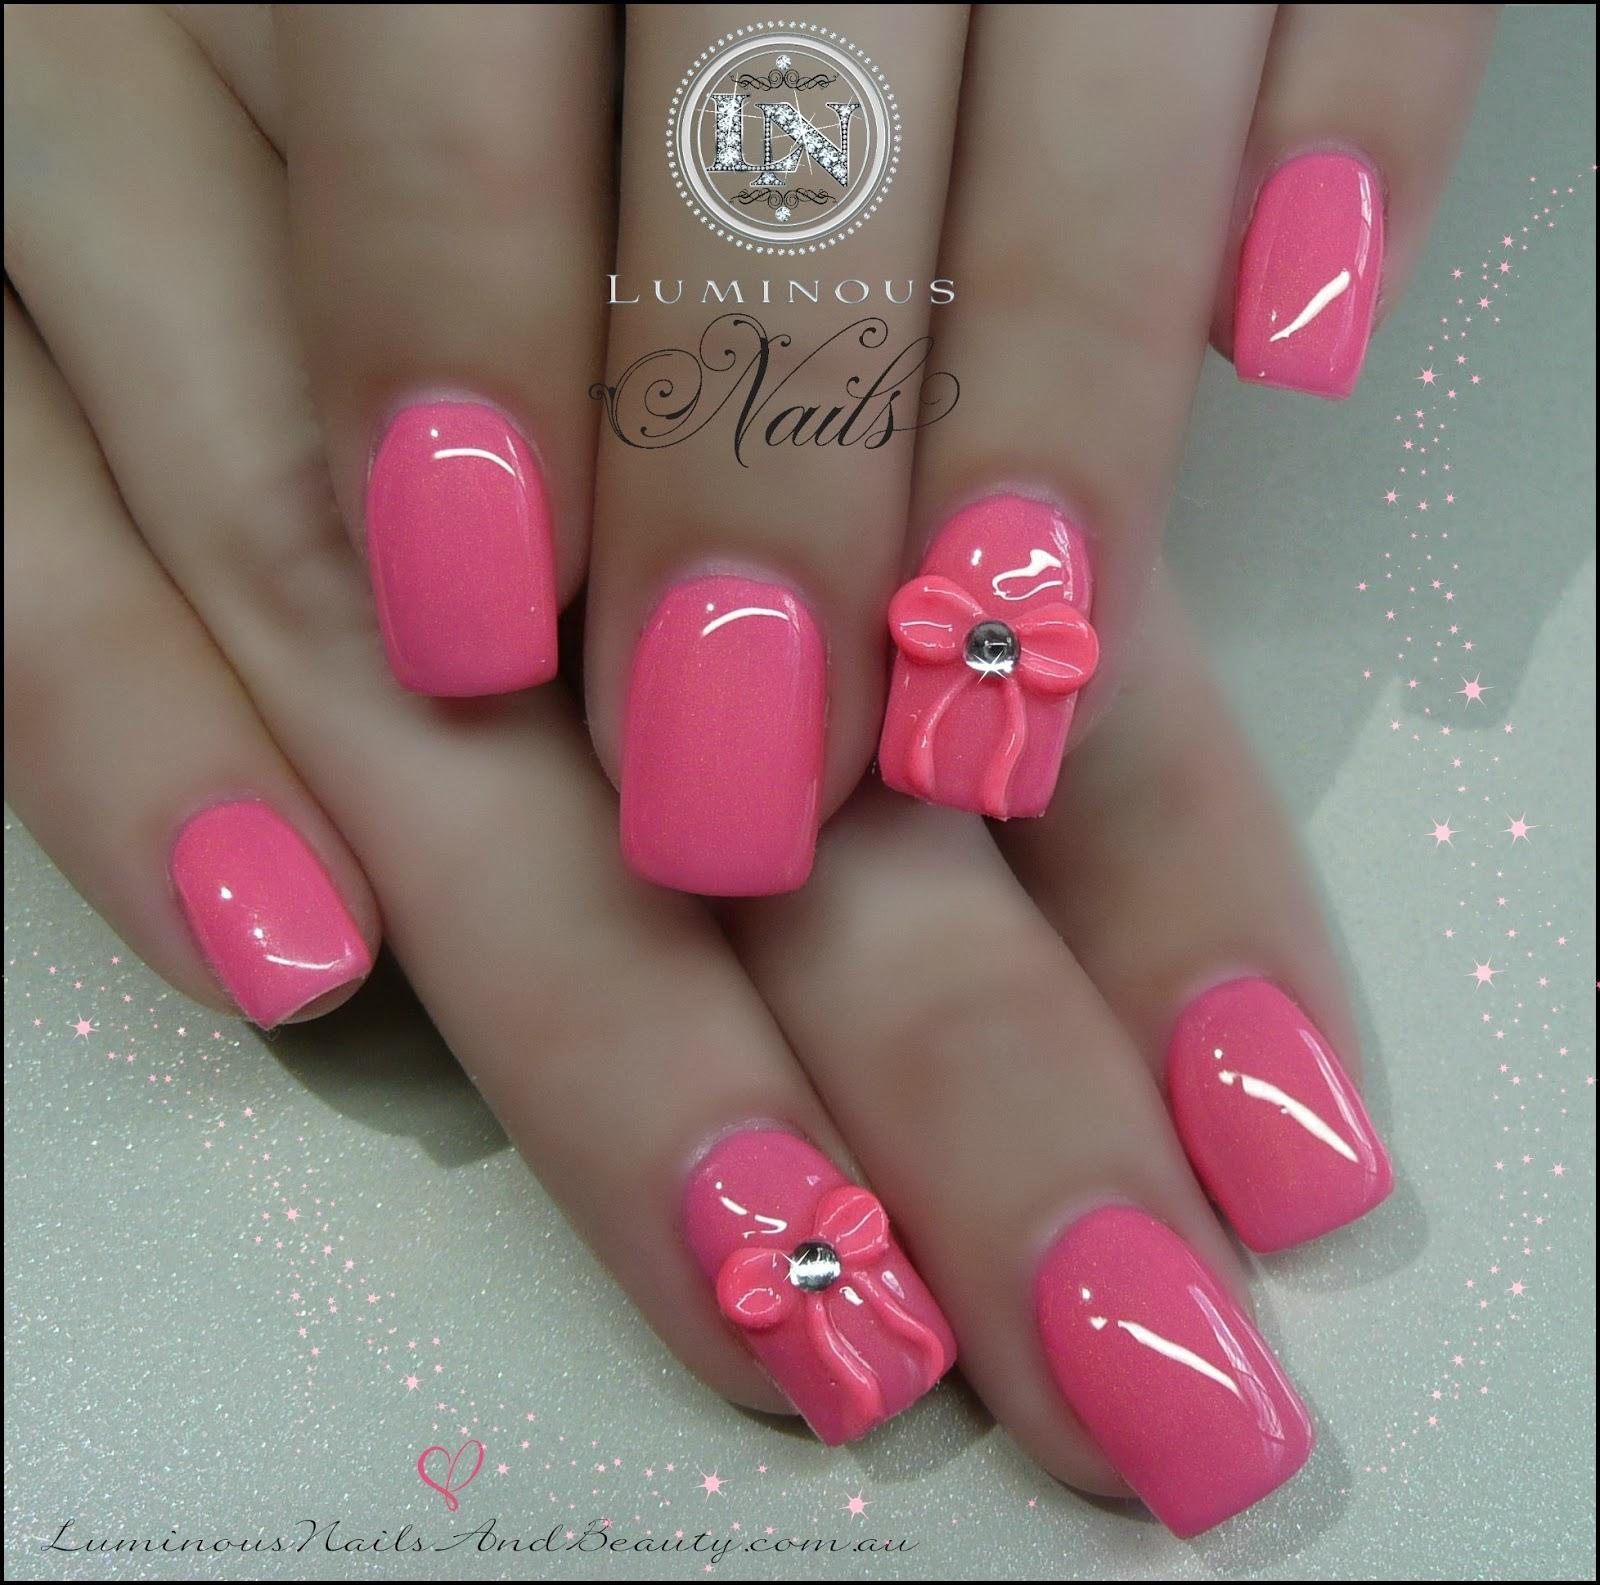 Luminous Nails: August 2013